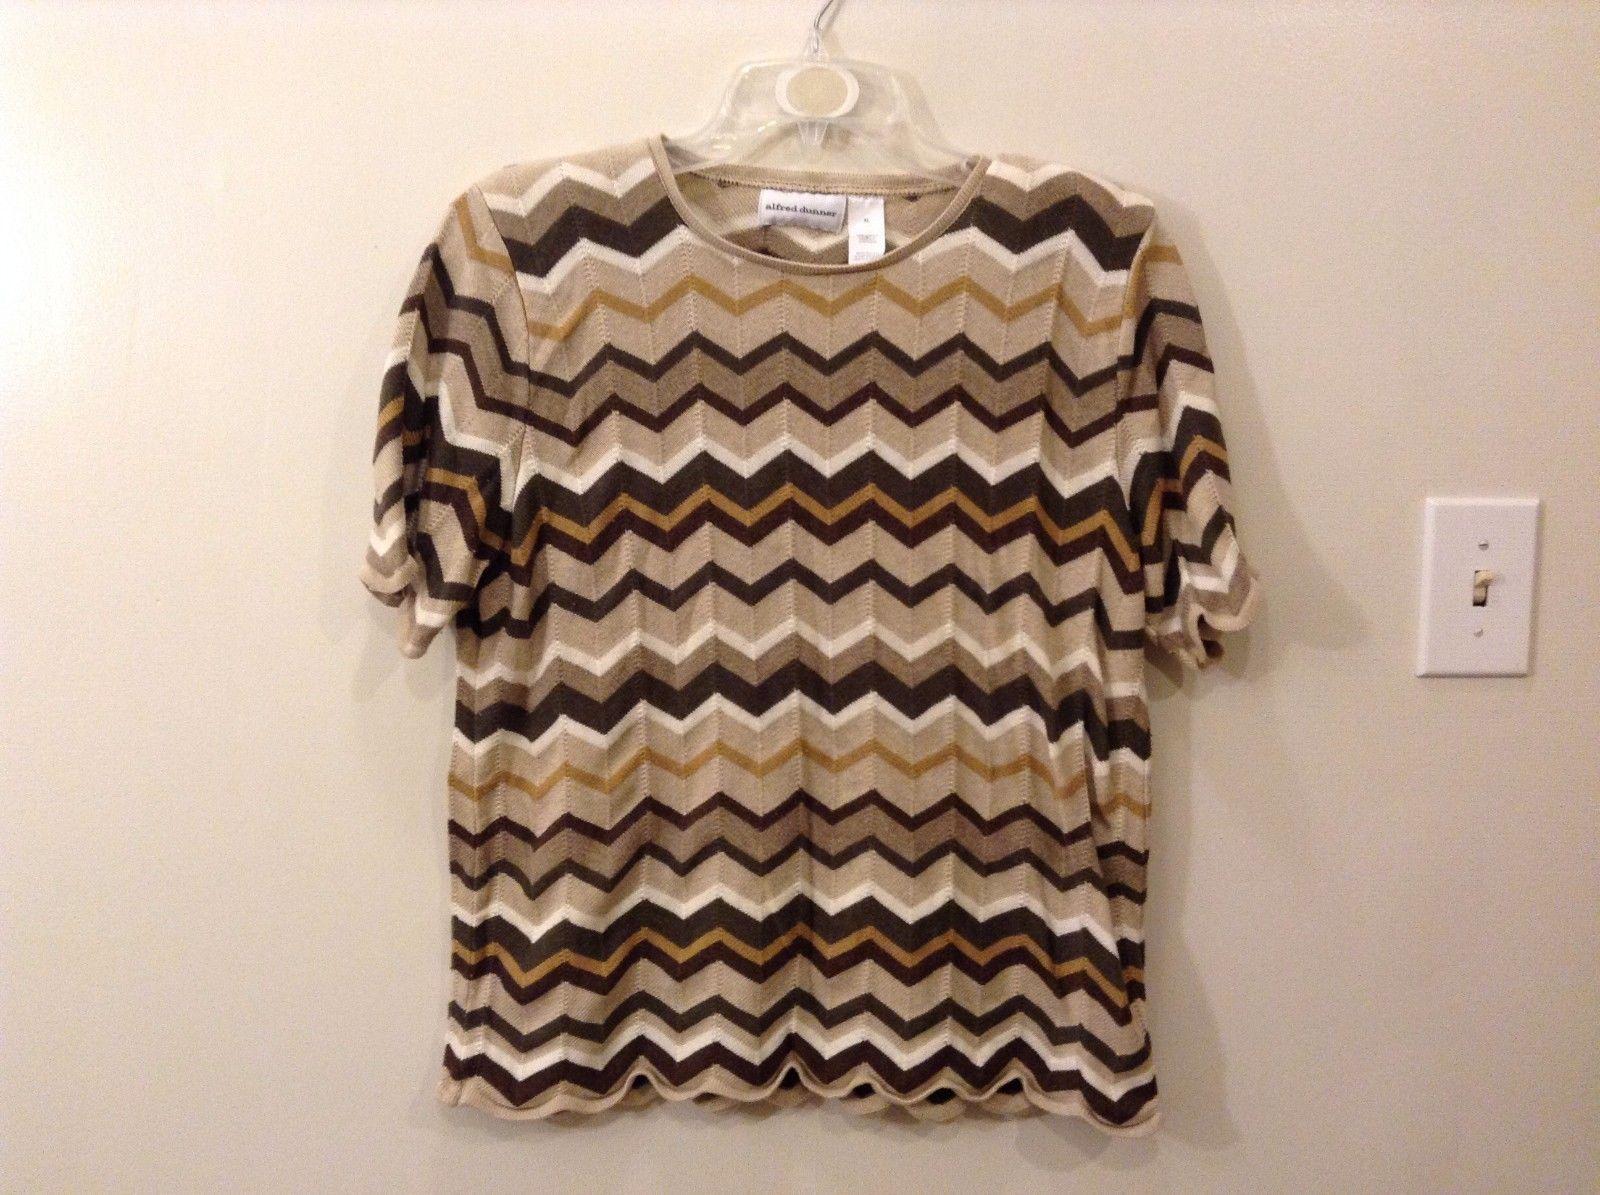 Alfred Dunner XL Neutral Toned Short Sleeve Sweatshirt Chevron Pattern Browns